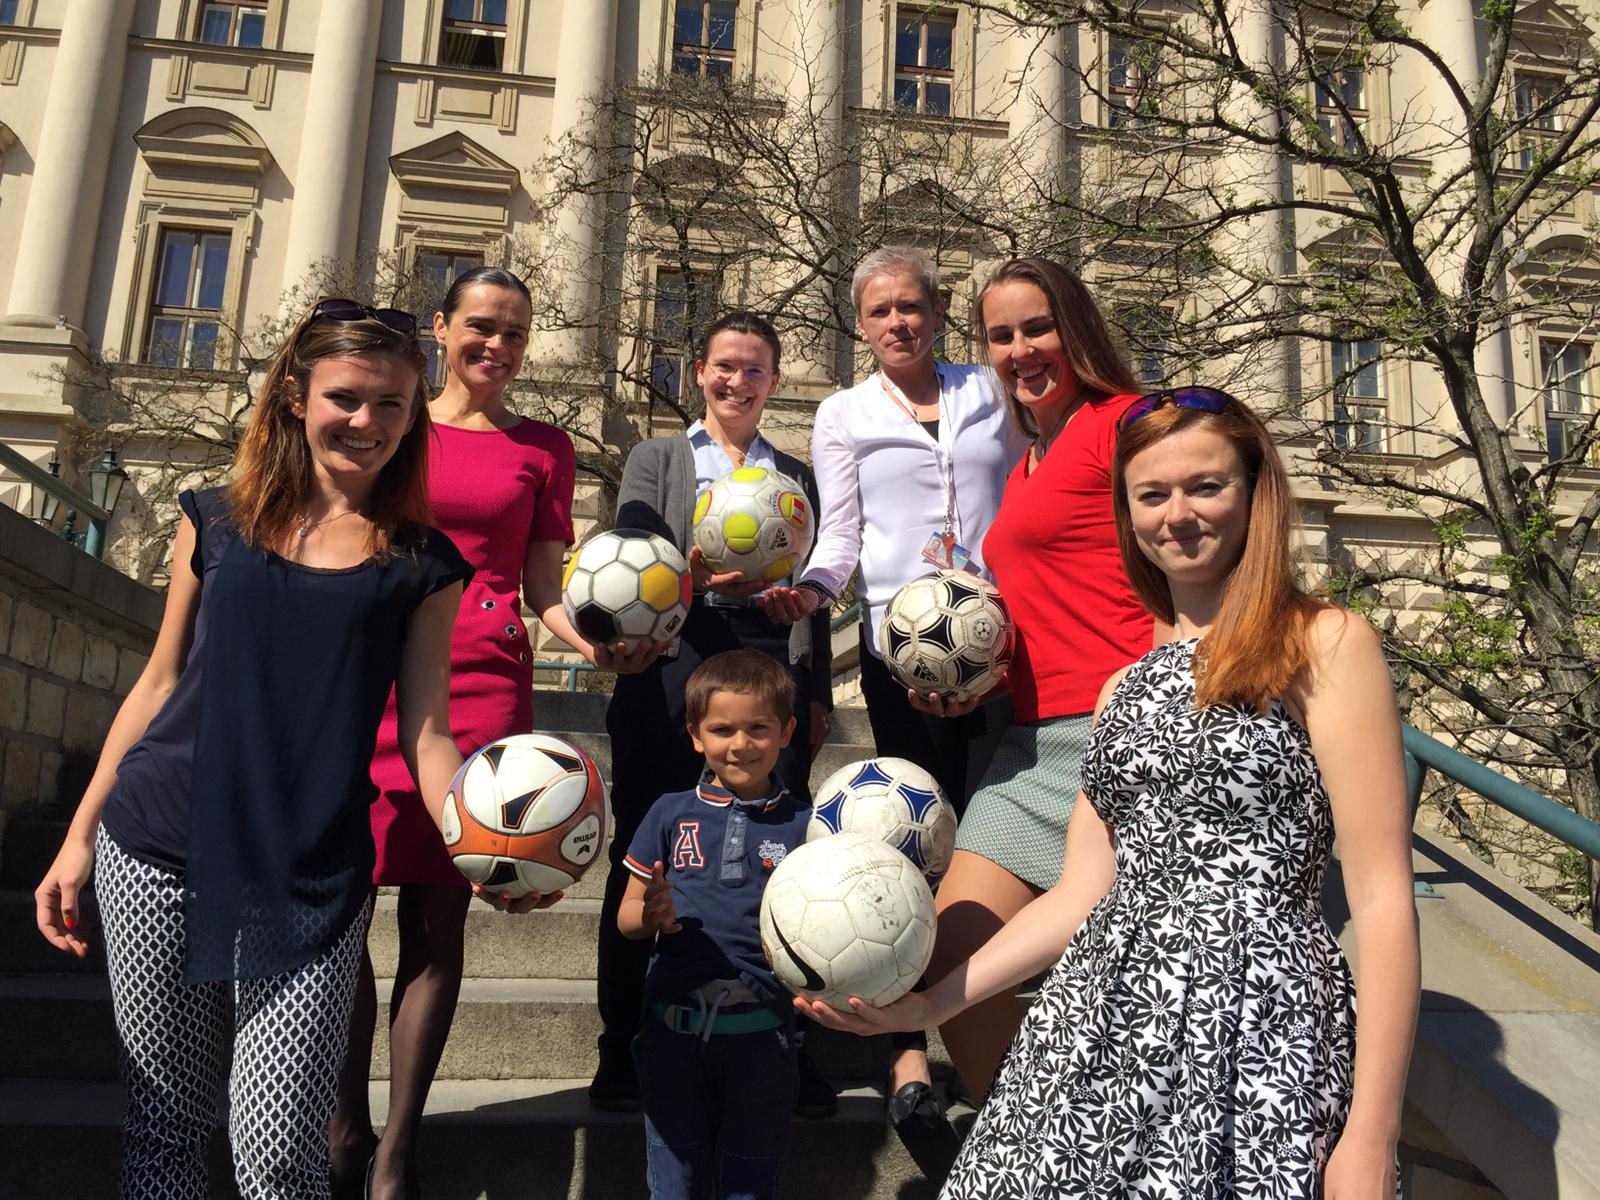 FK Lvice Černín - Global Goal 16 - Peace, Justice & Strong Institutions